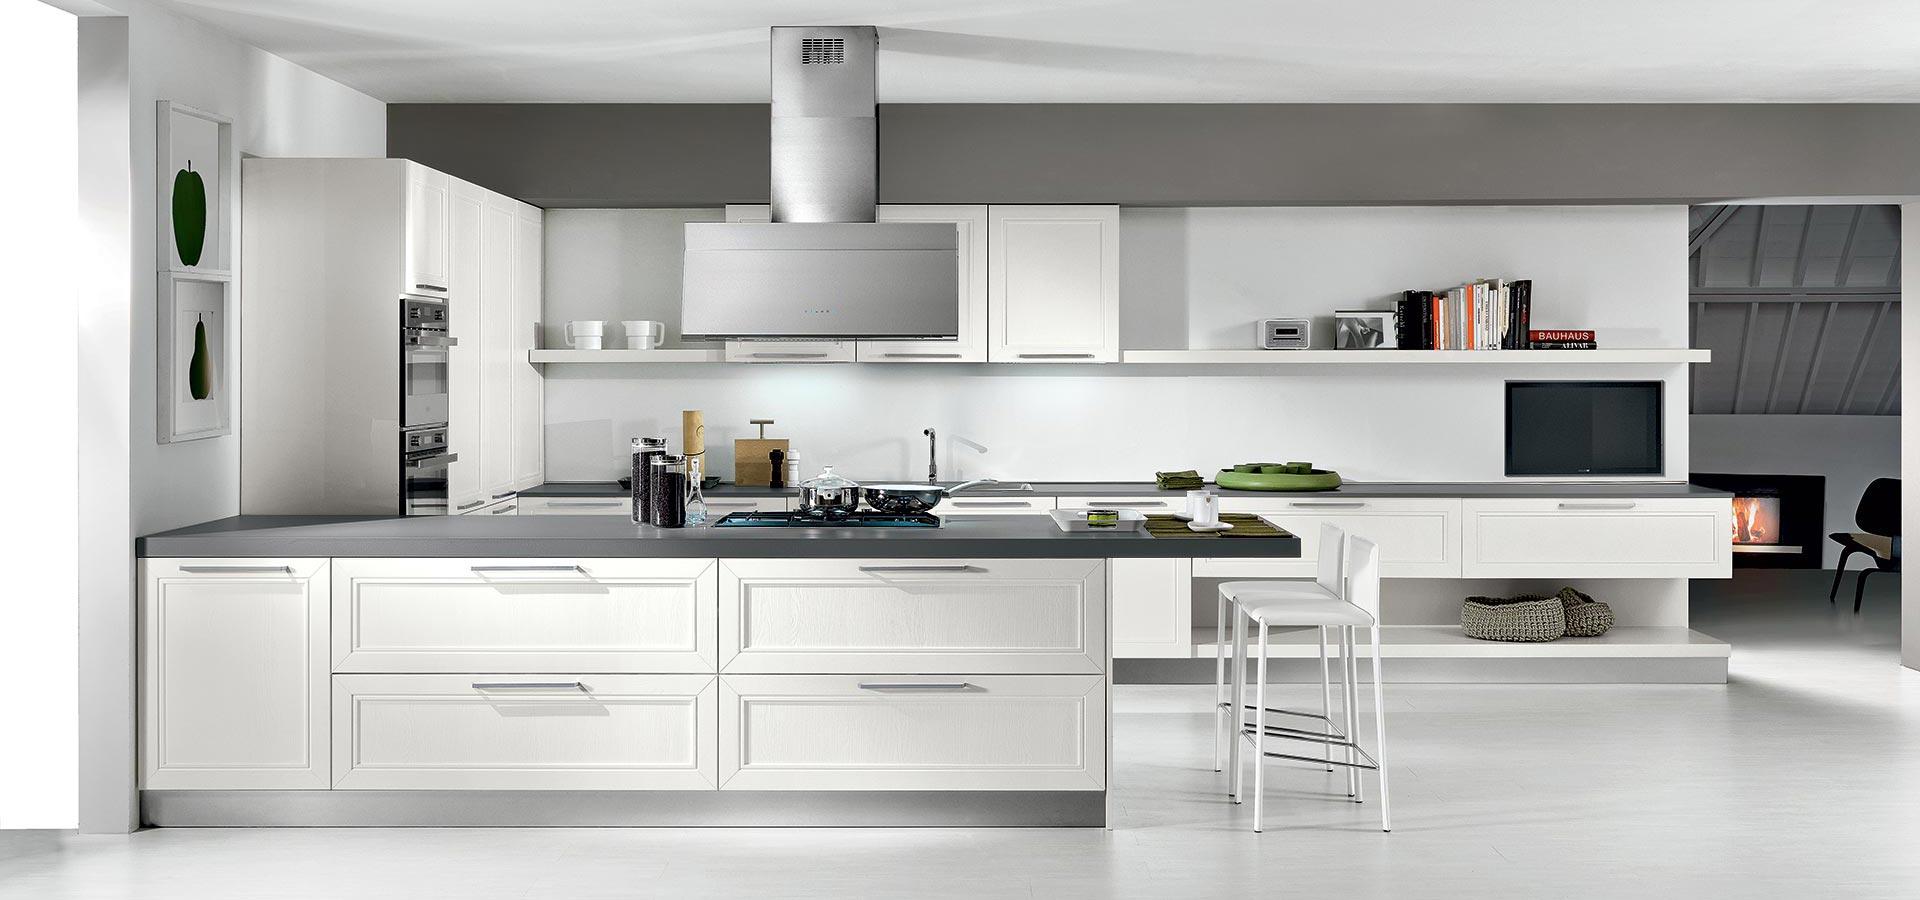 Emejing Arredo 3 Opinioni Gallery - Home Design Inspiration ...